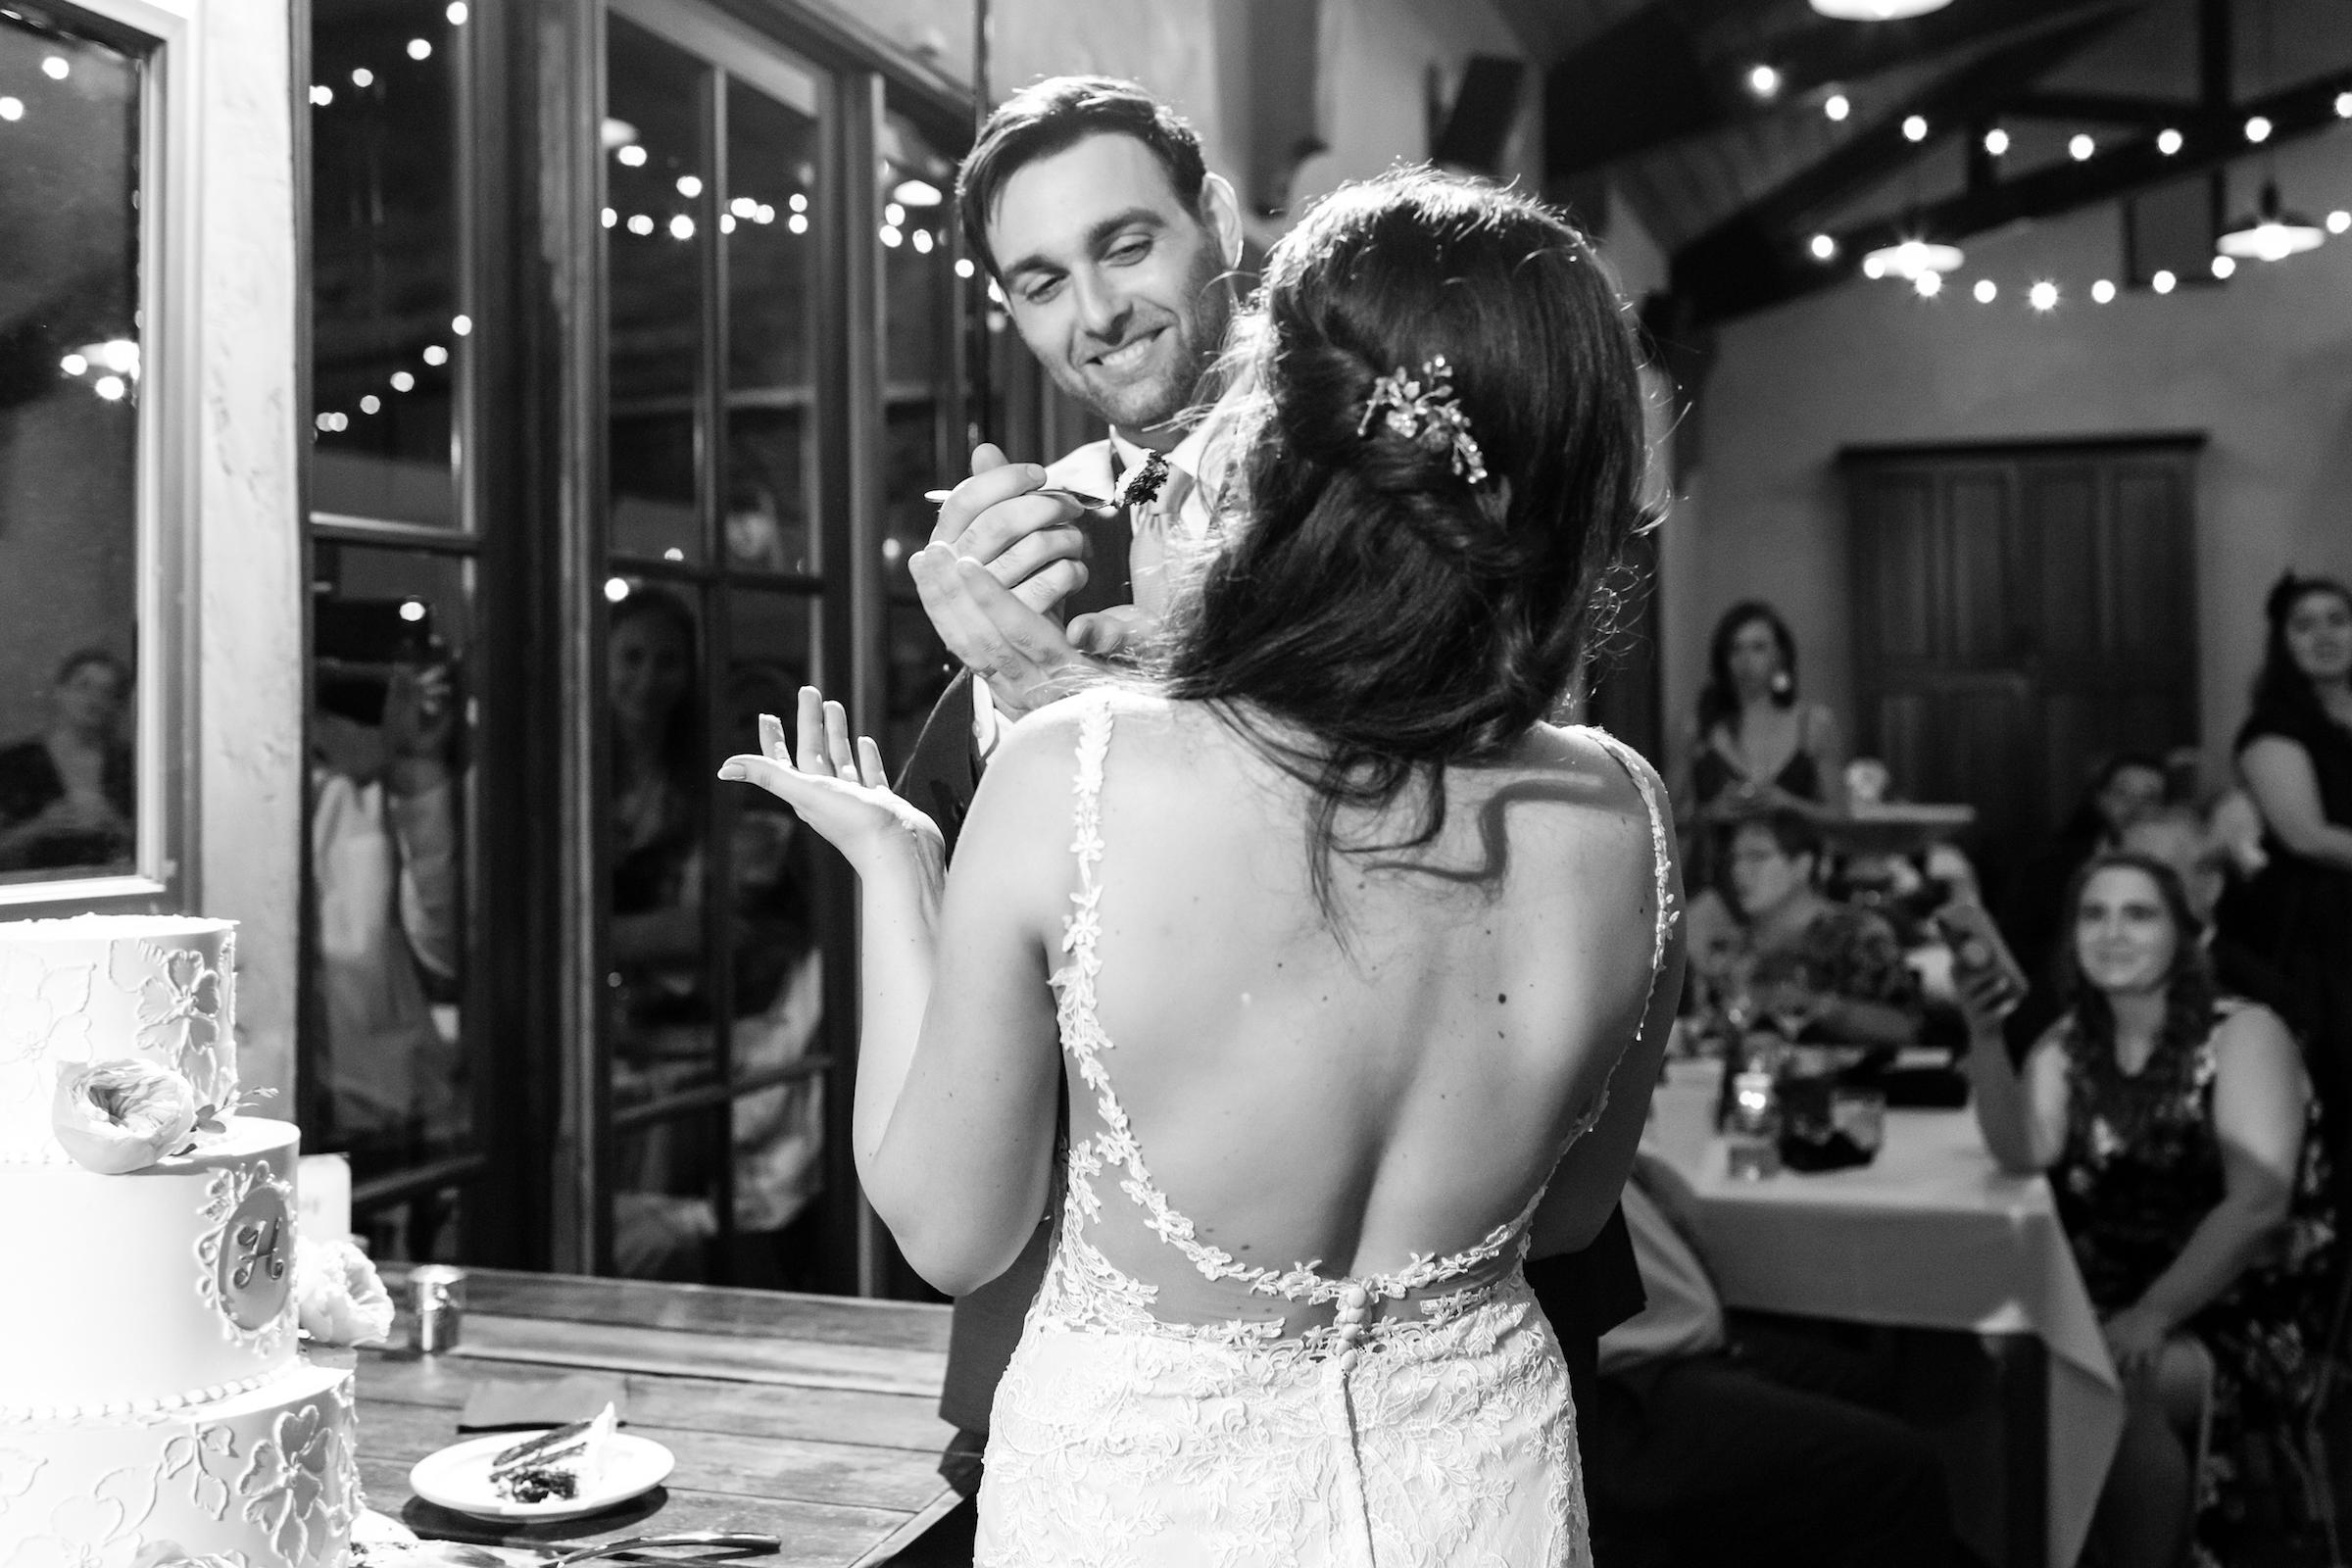 brielle-davis-events-kairos-photography-chandler-hill-wedding-607.jpg